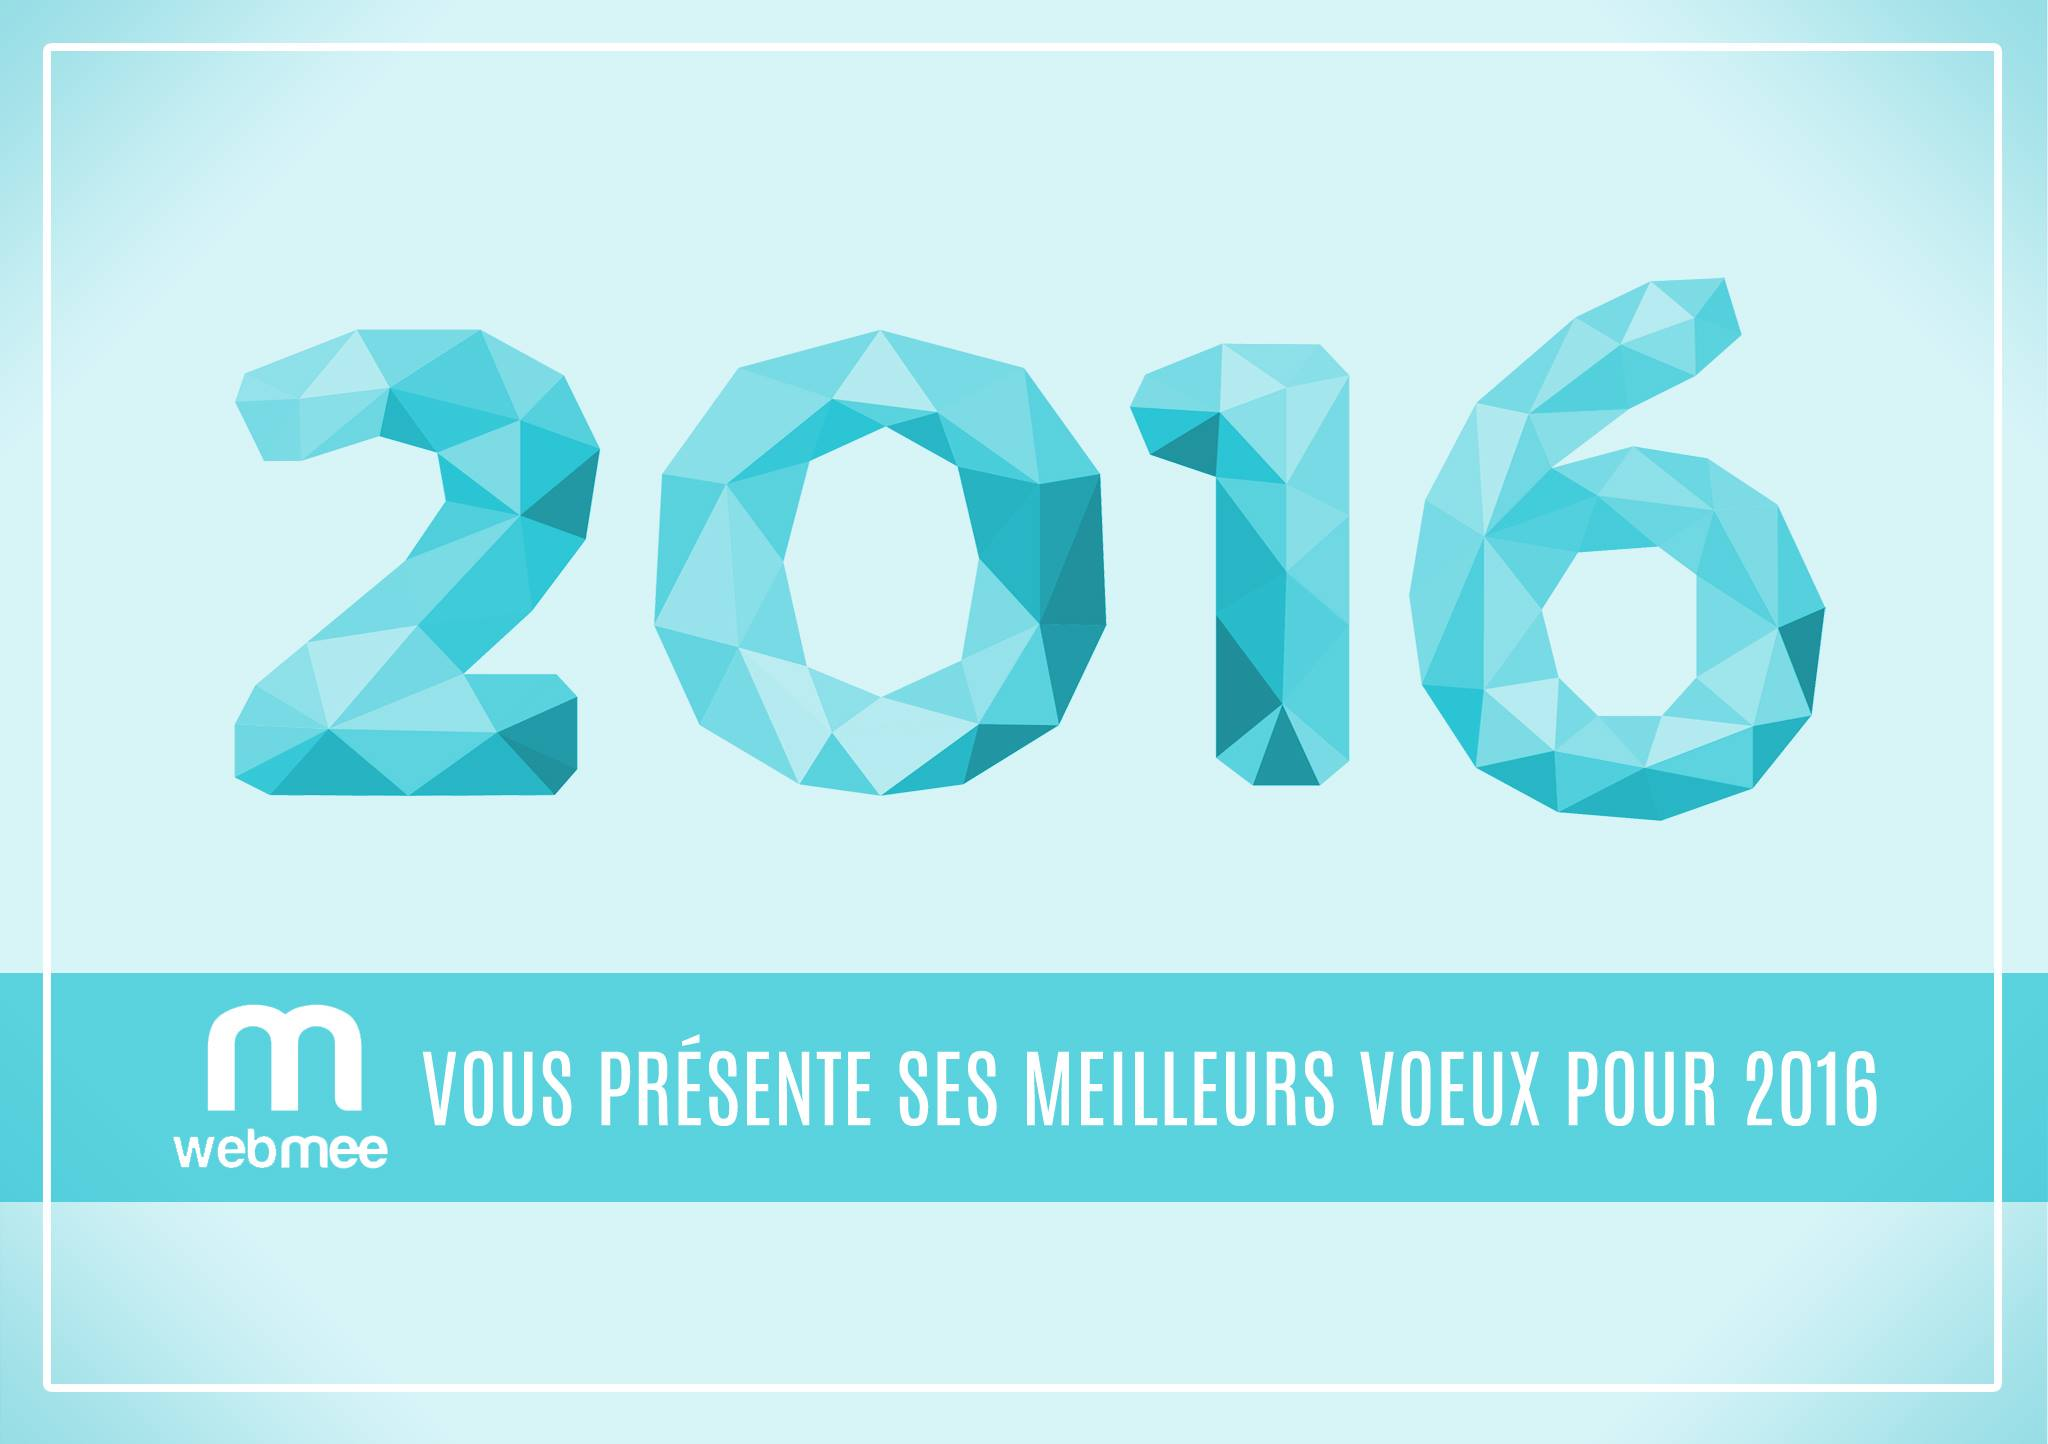 webmee - Bonne année 2016 !